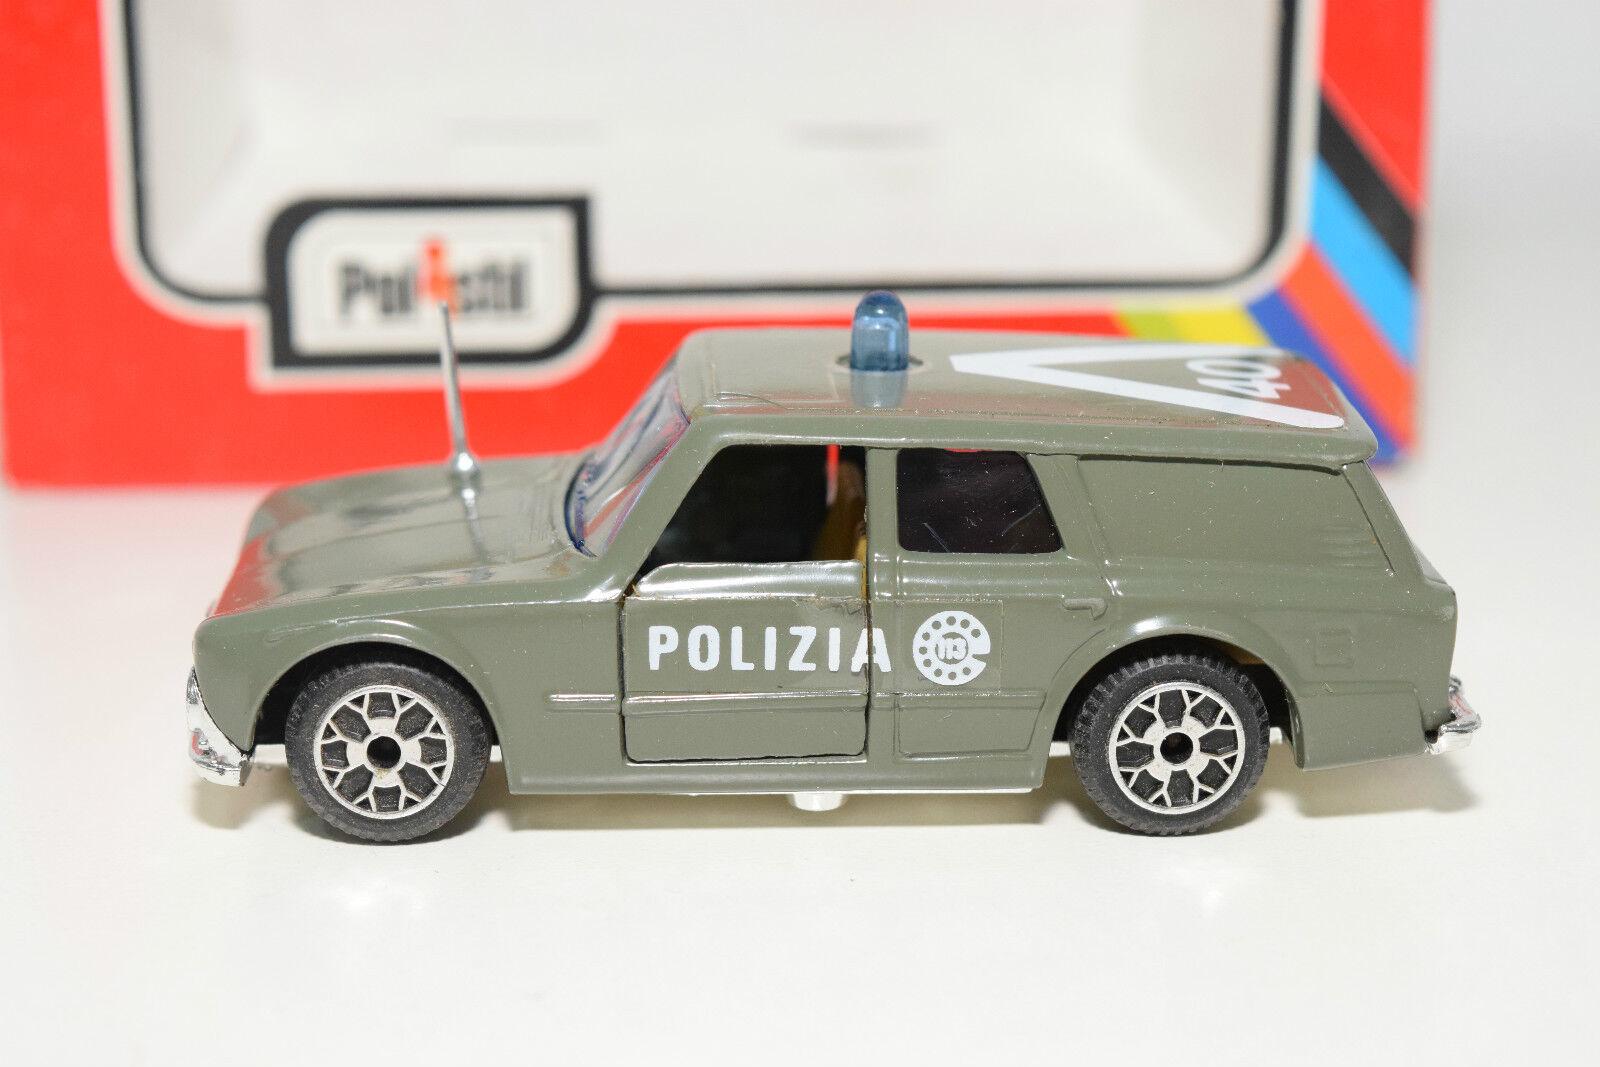 POLISTIL CE19 CE 19 CE-19 ALFA ROMEO GIULIA FAM. FAM. FAM. POLIZIA MINT BOXED RARE SELTEN 4e3d90